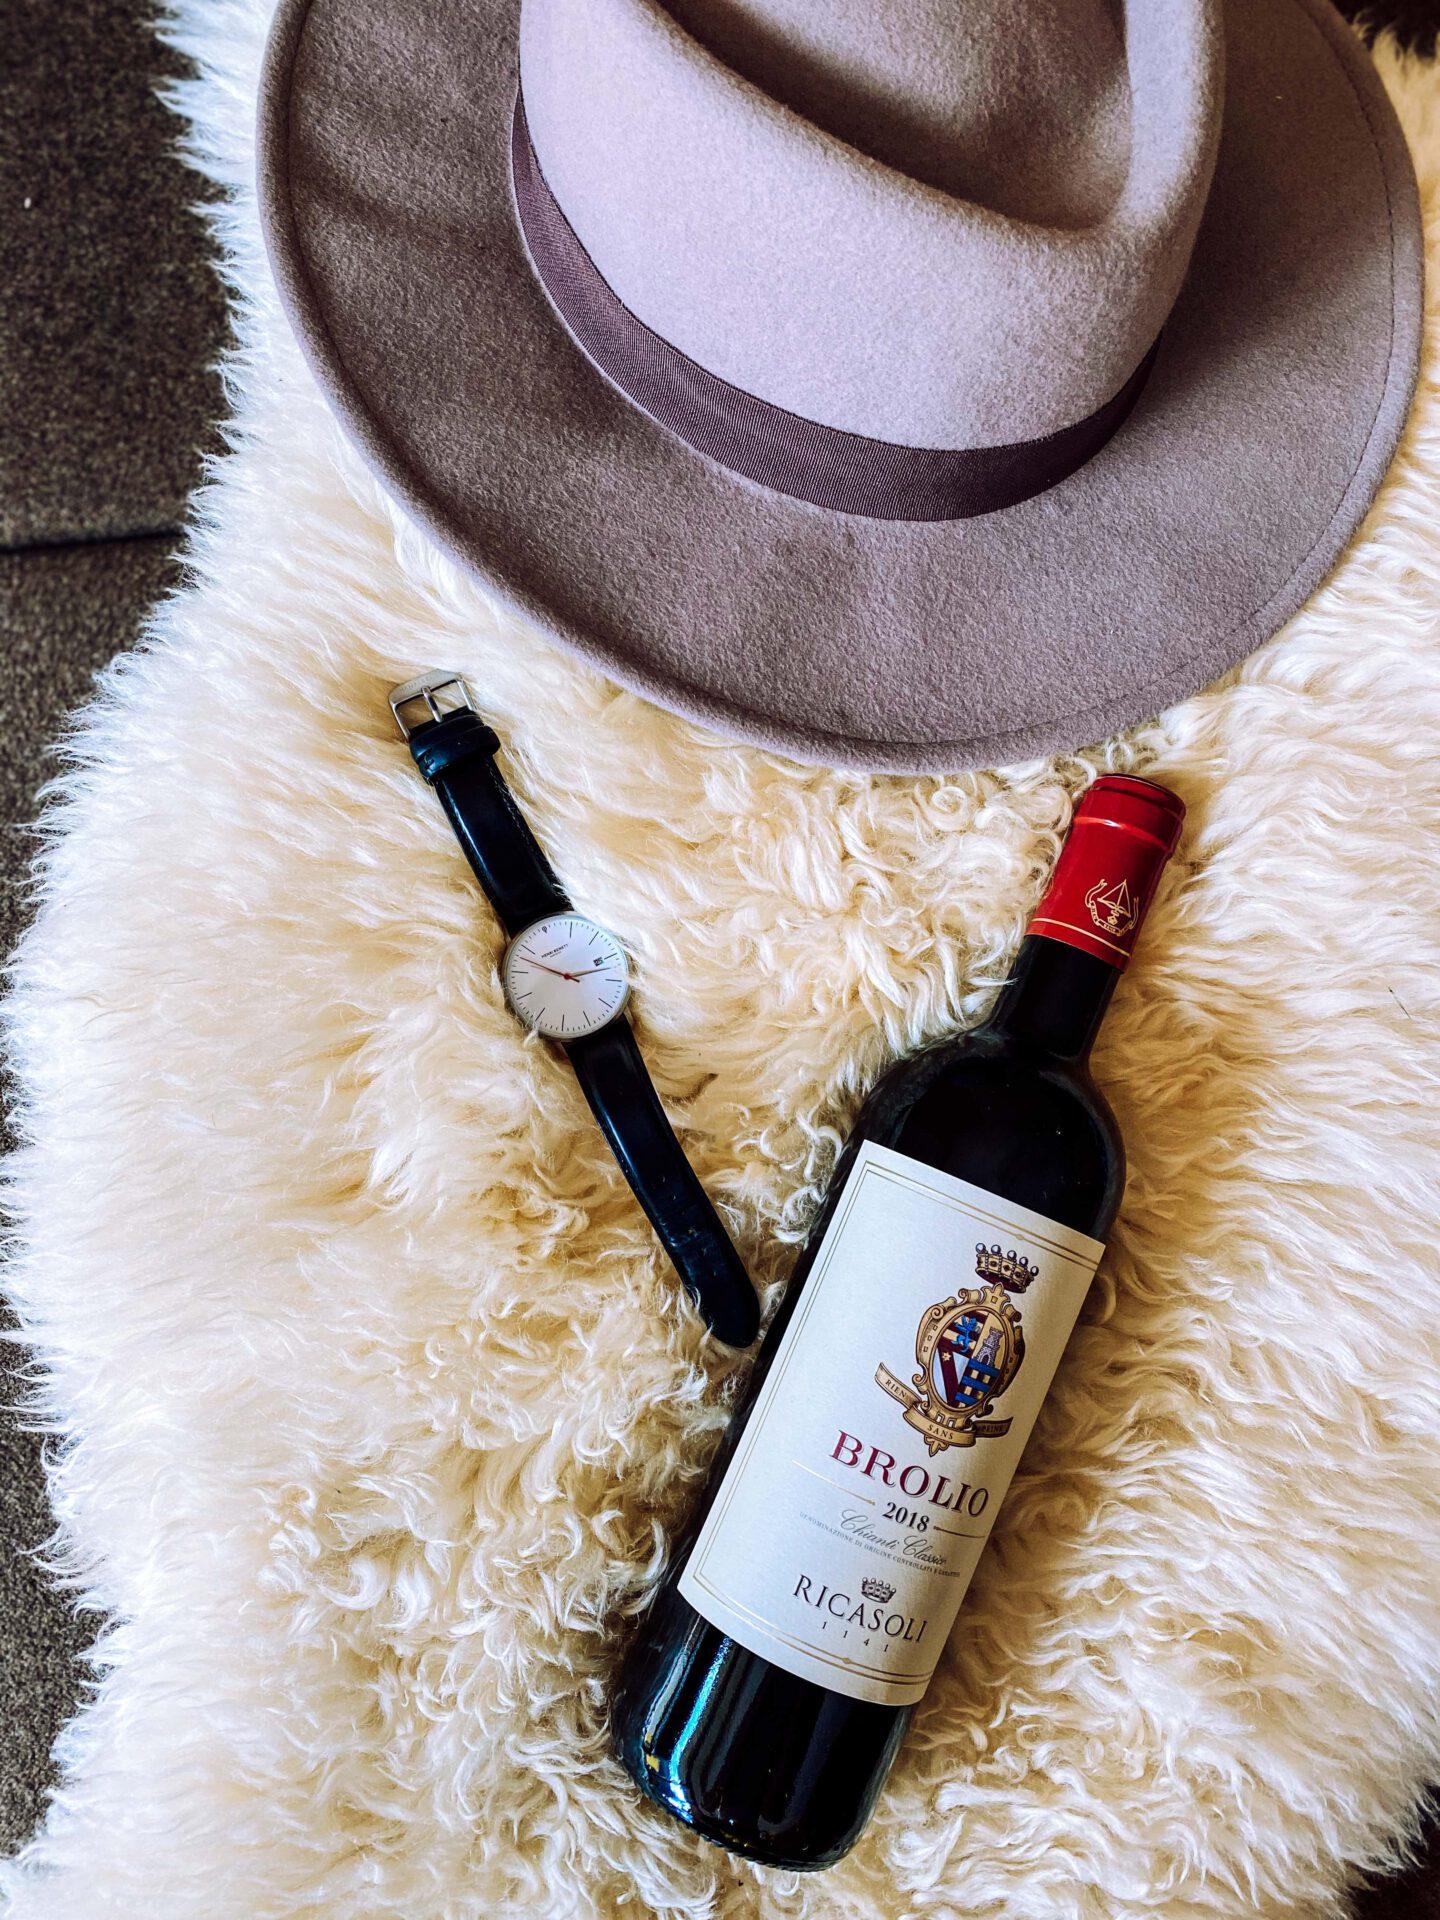 ricasoli brolio rotwein italien gentlemens journey